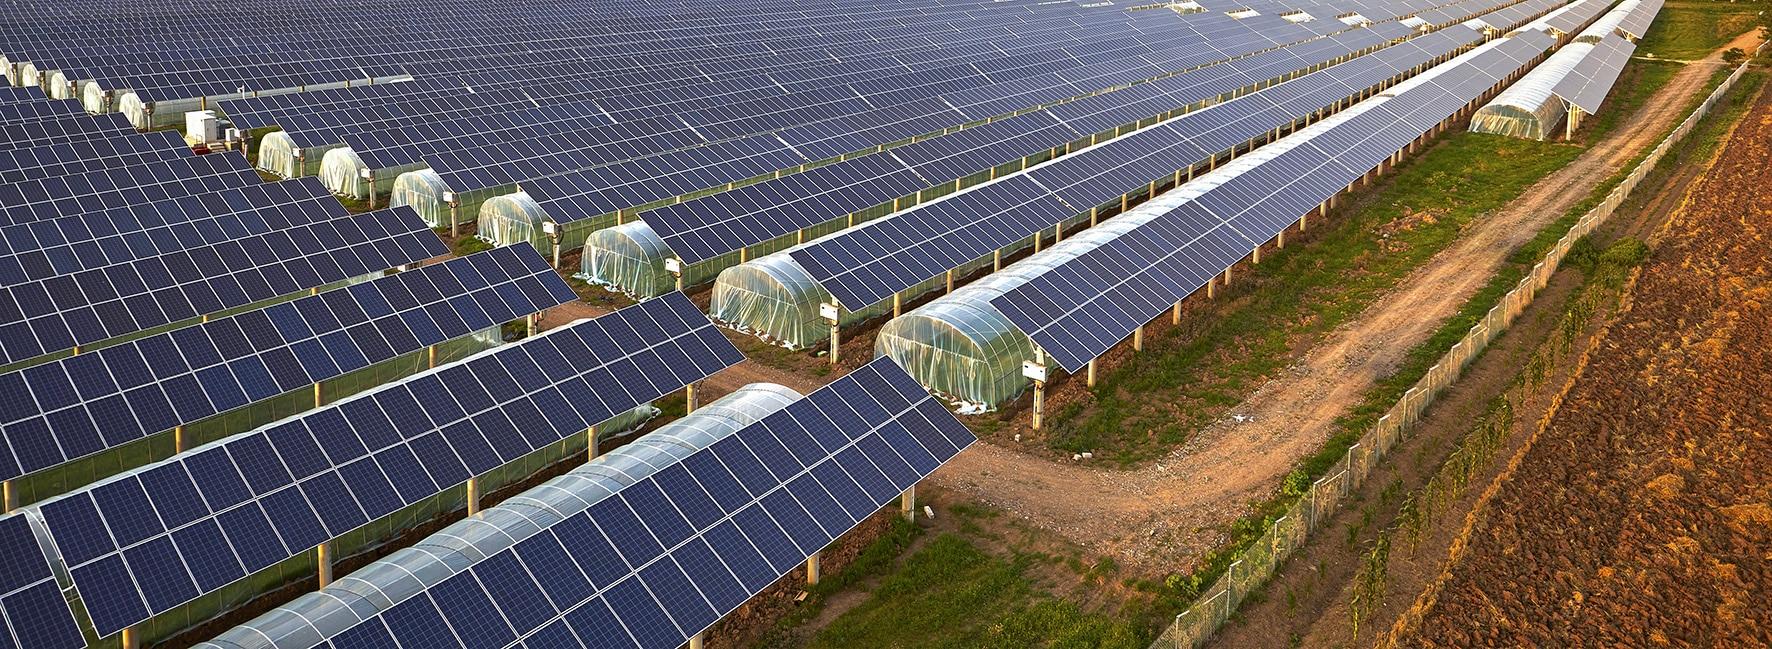 photovoltaique conteste reforme contrats